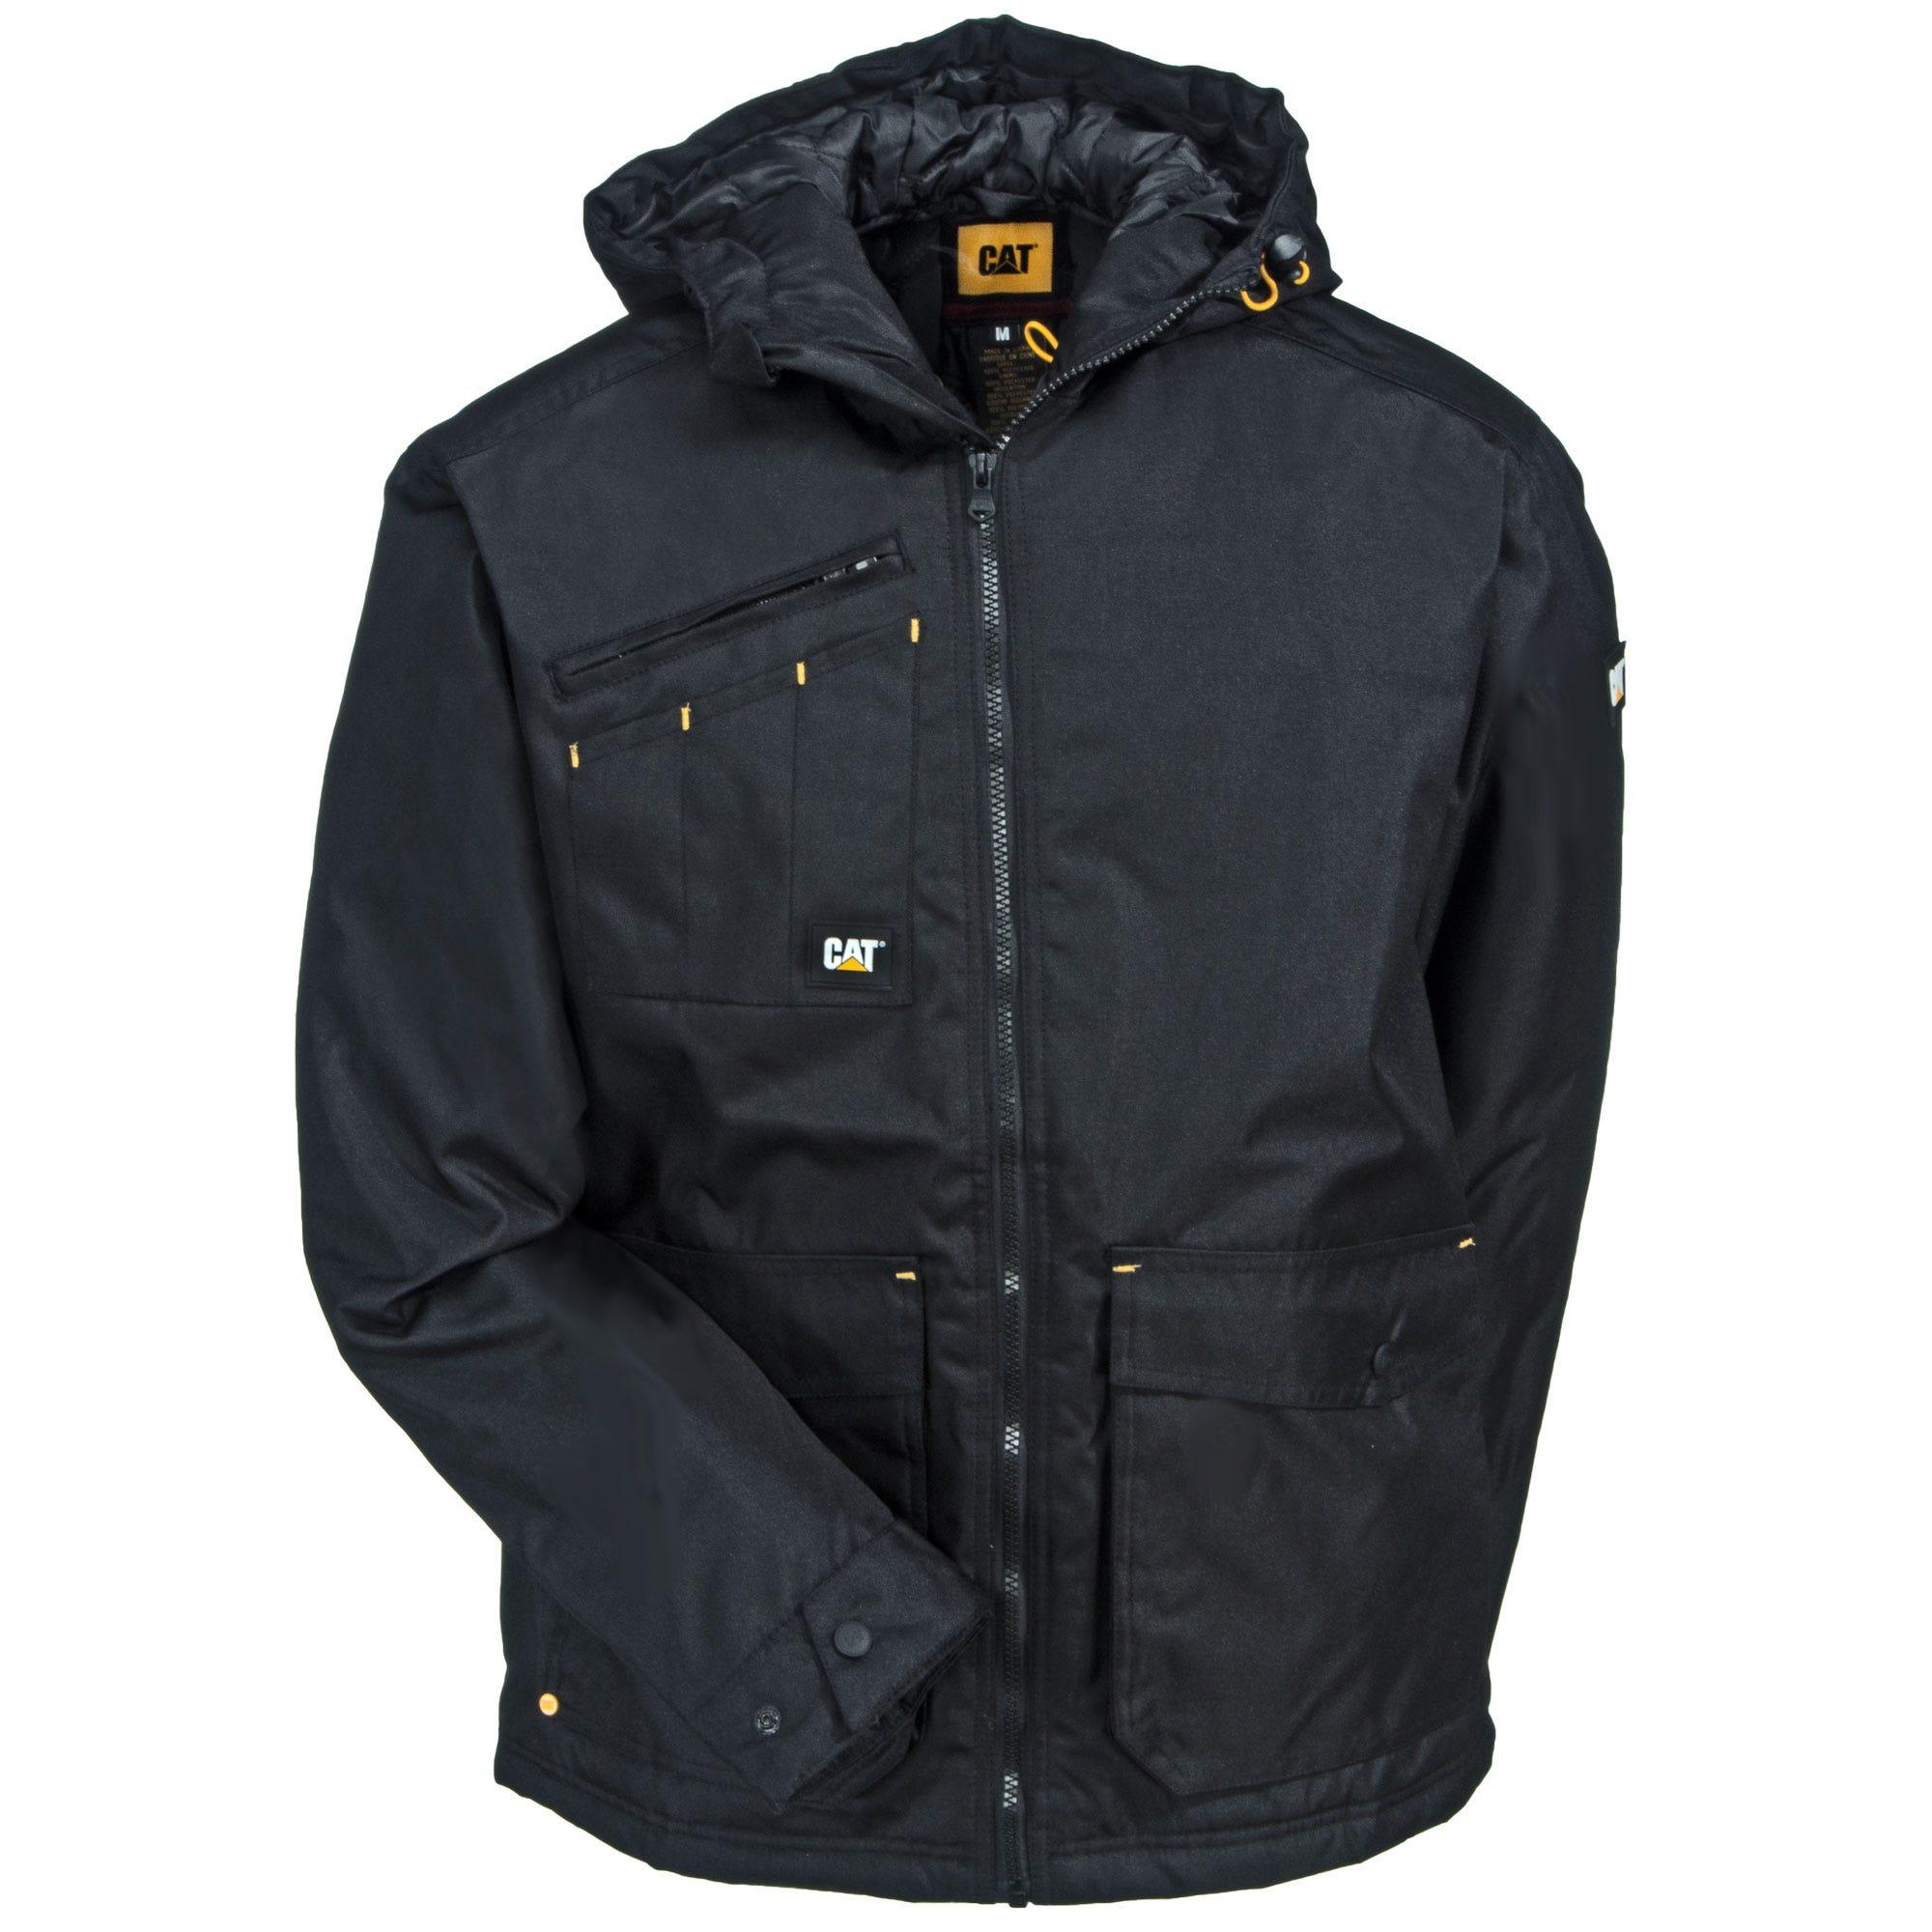 Cat Workwear Men S Jackets Cat Workwear Jackets And